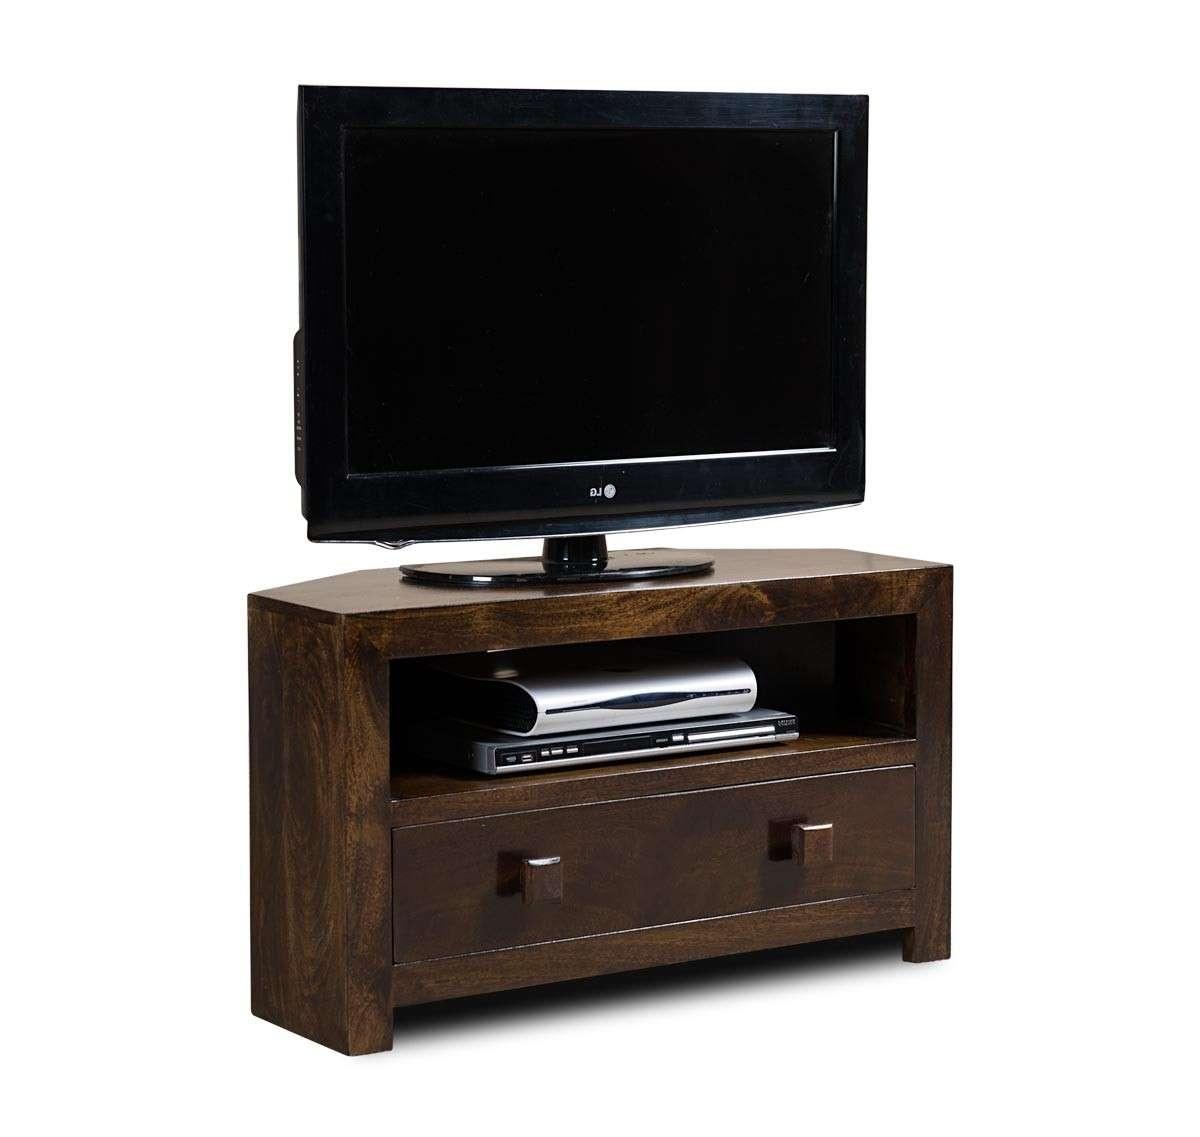 Dakota Dark Mango Small Corner Tv Stand | Casa Bella Furniture Uk Within Dark Brown Corner Tv Stands (View 19 of 20)